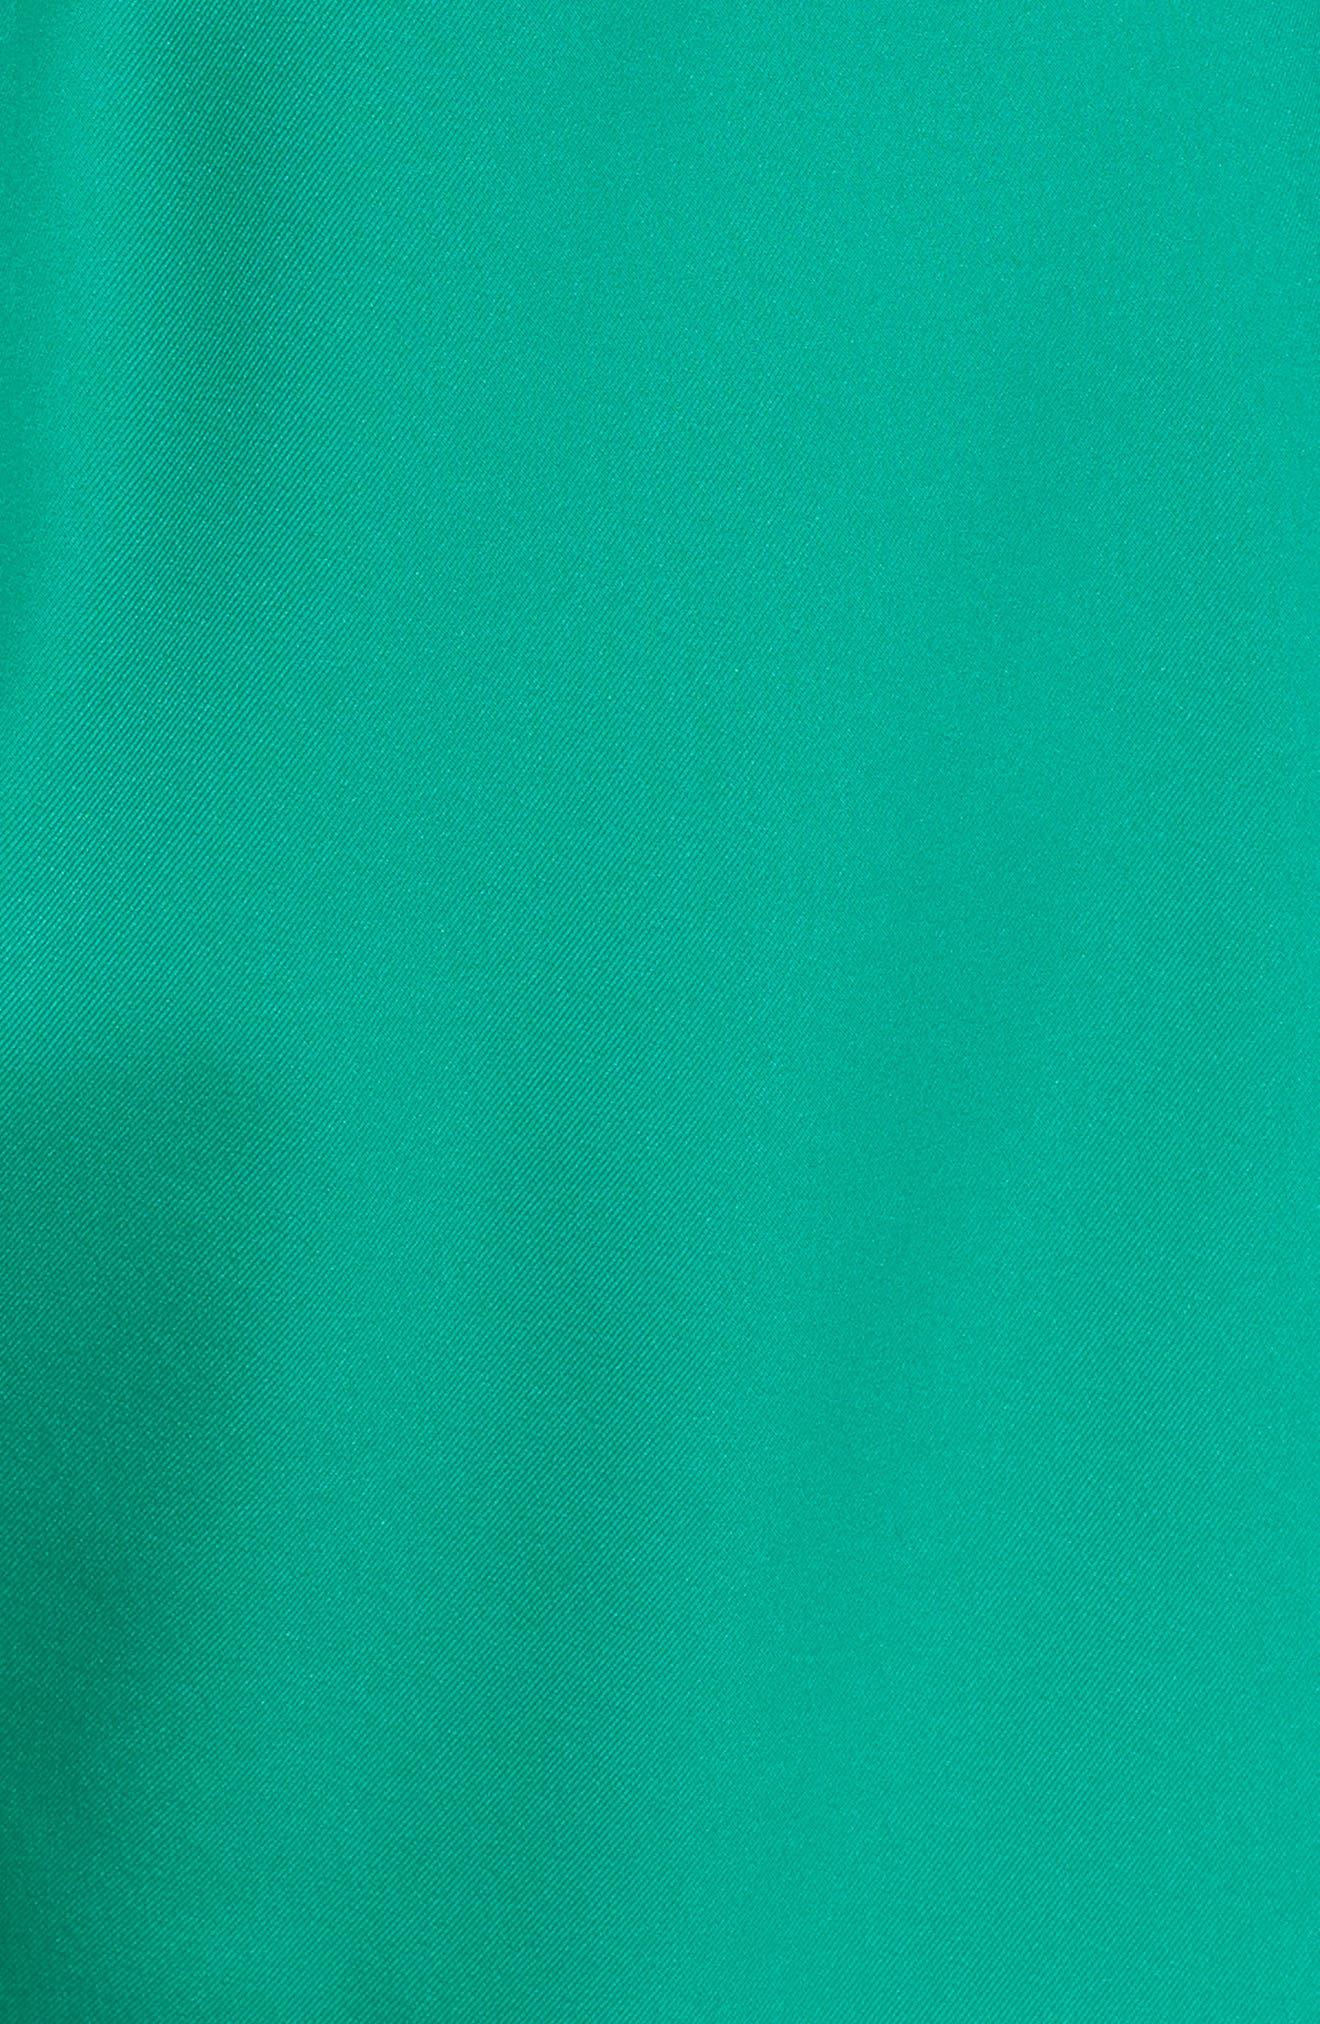 Vital Swim Trunks,                             Alternate thumbnail 18, color,